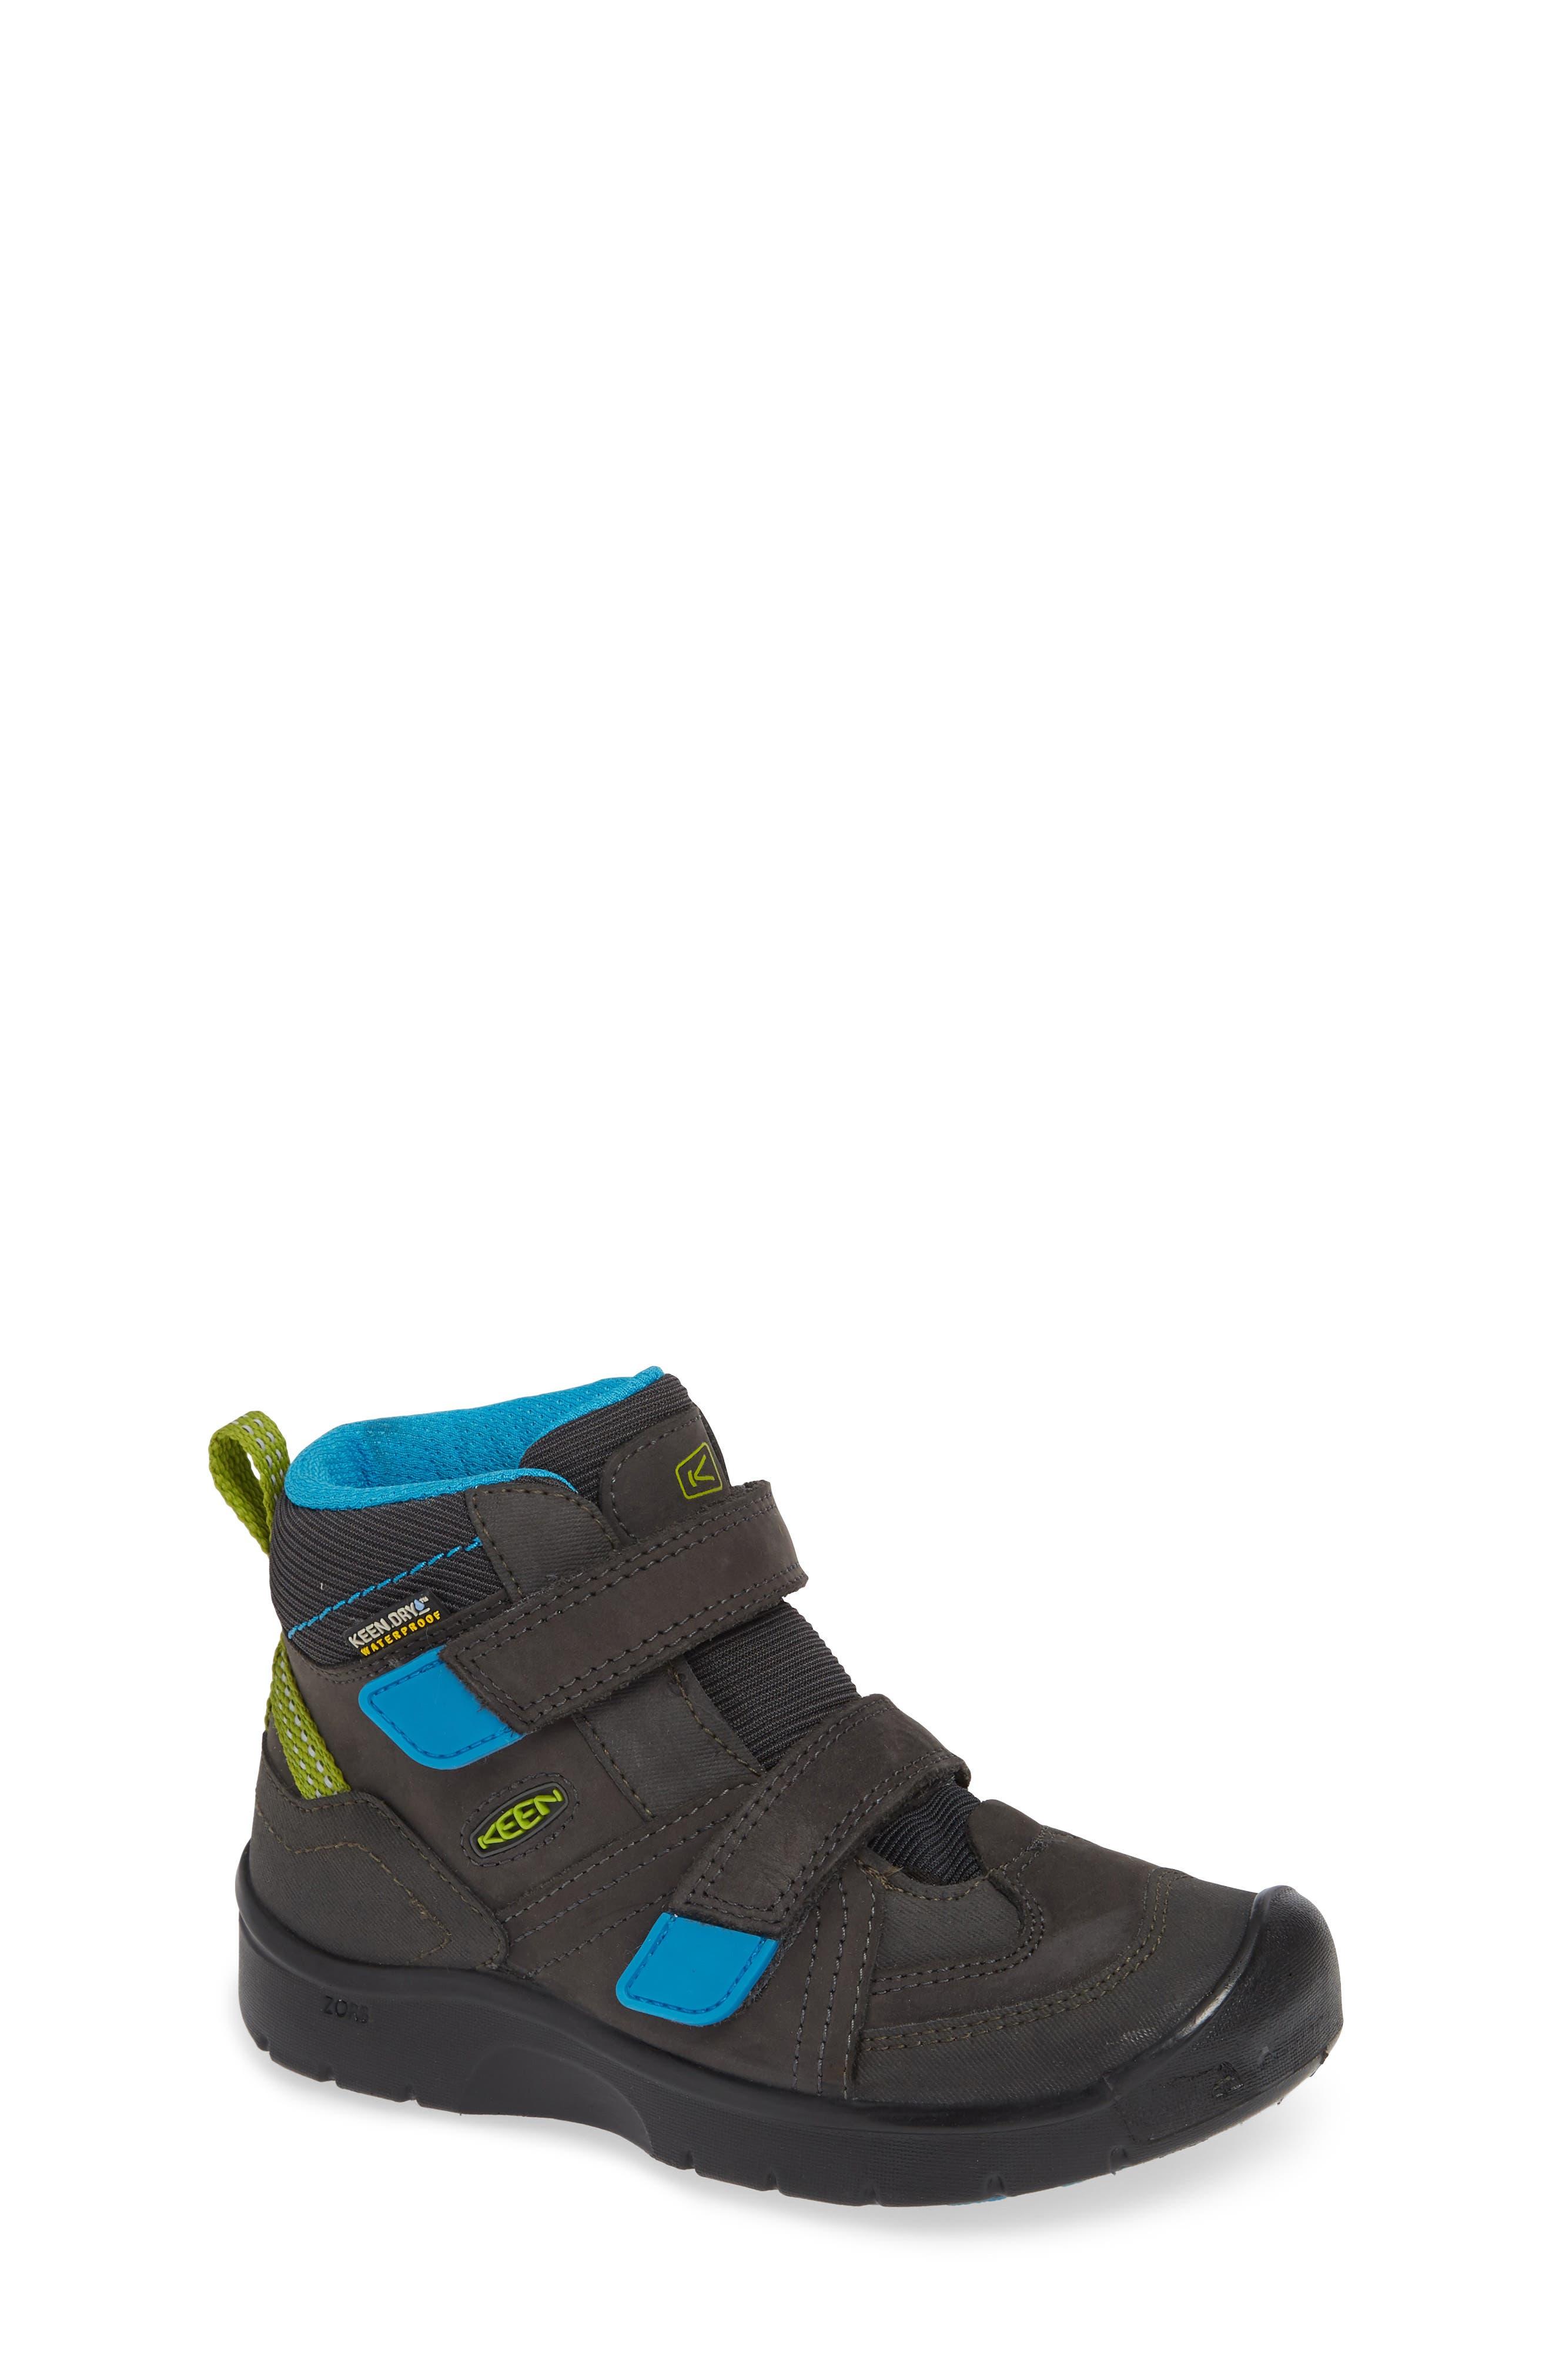 Hikeport Strap Waterproof Mid Boot,                             Main thumbnail 1, color,